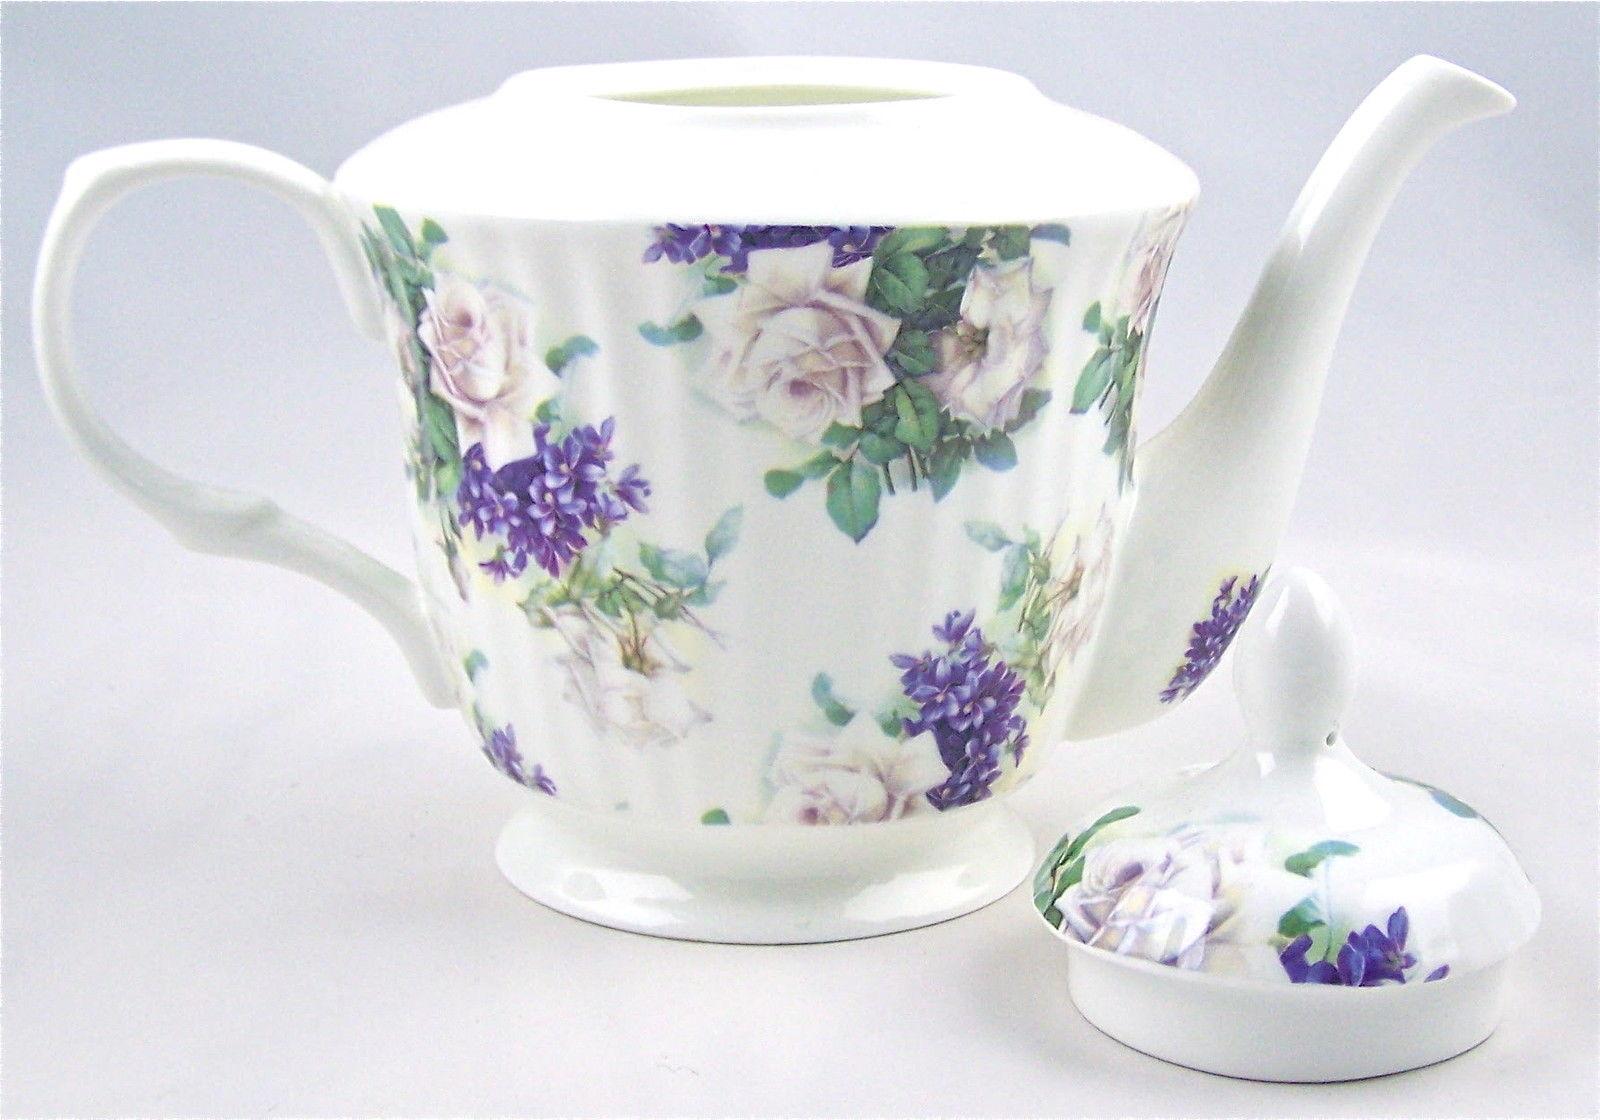 FINE BONE CHINA 6 CUP LARGE WHITE TEA POT